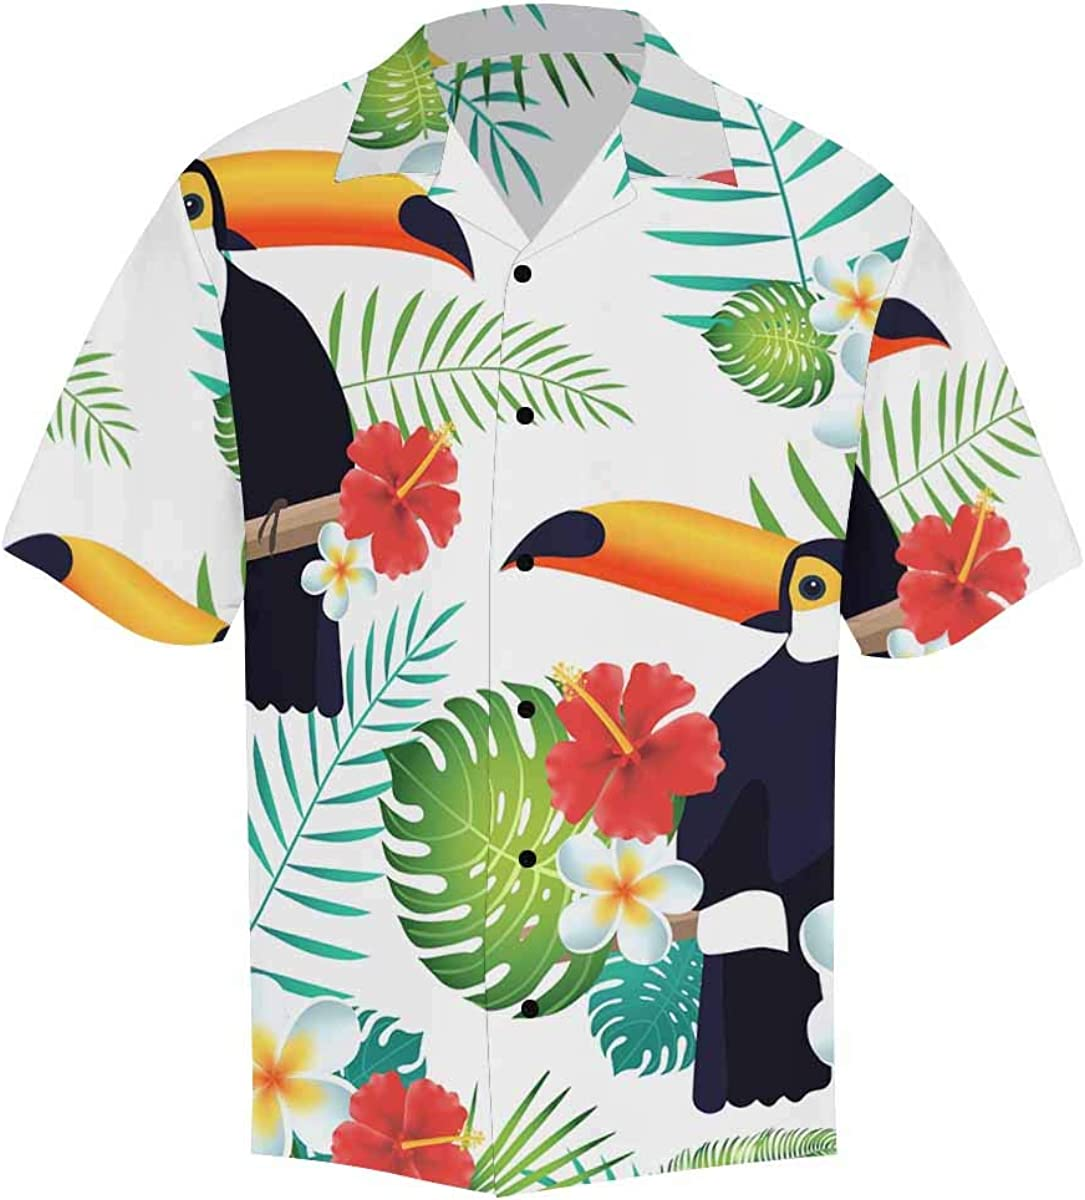 InterestPrint Men's Casual Button Down Short Sleeve Watercolor Tropical Flamingo Hawaiian Shirt (S-5XL)